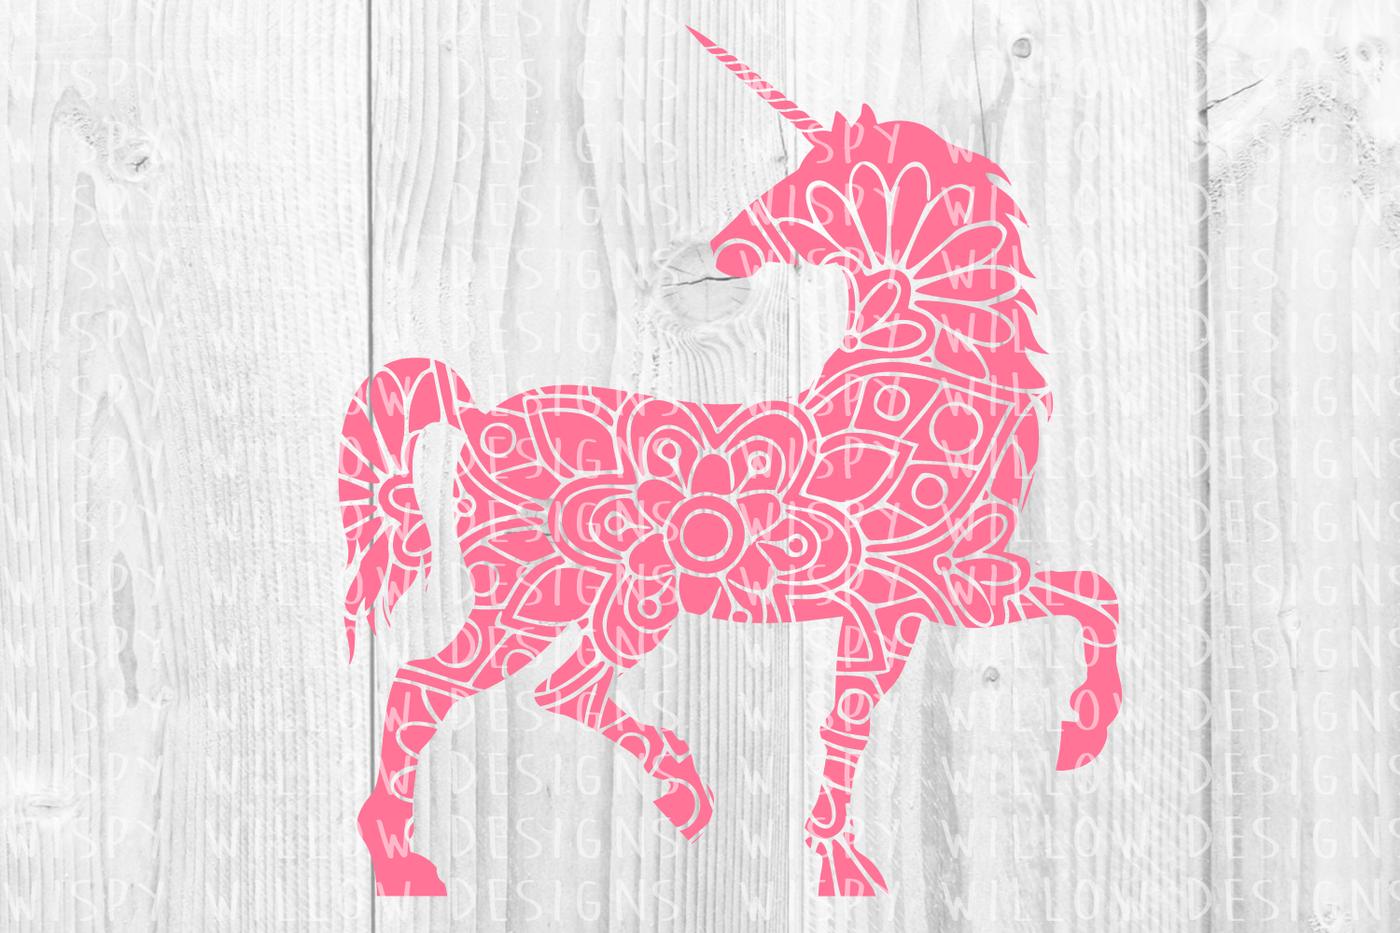 Unicorn Floral Mandala Svg Dxf Eps Png Jpg Pdf By Wispy Willow